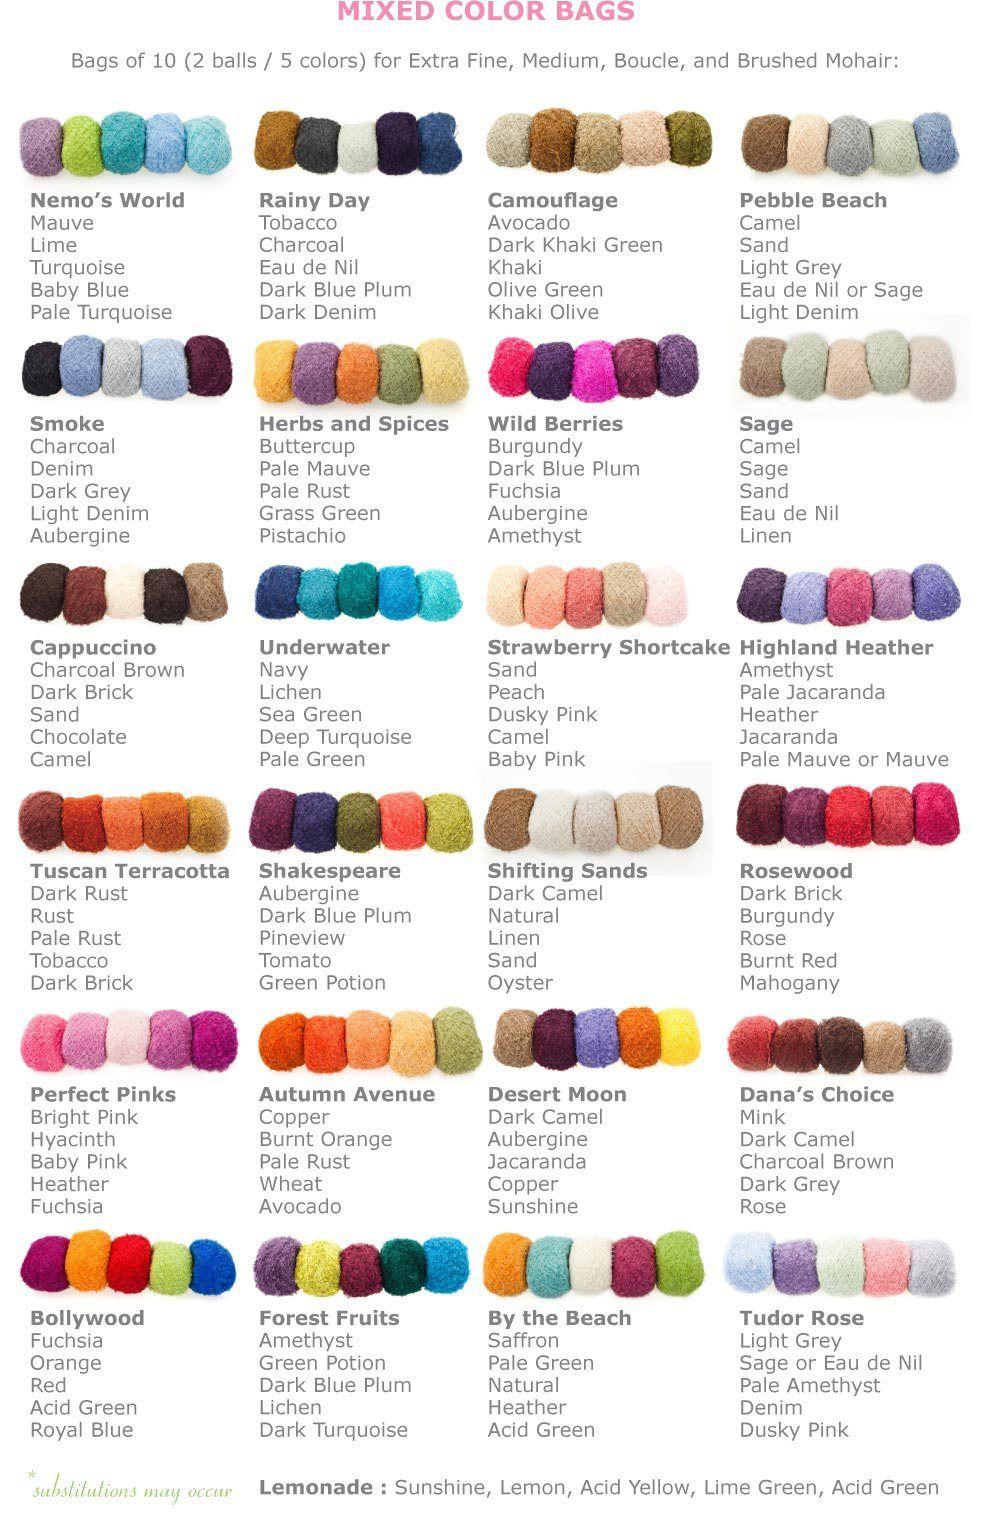 Mixed Bag Color Chart On Be Sweet Yarns Jpg 1 000 1 522 Pixels Yarn Color Combinations Yarn Colors Yarn